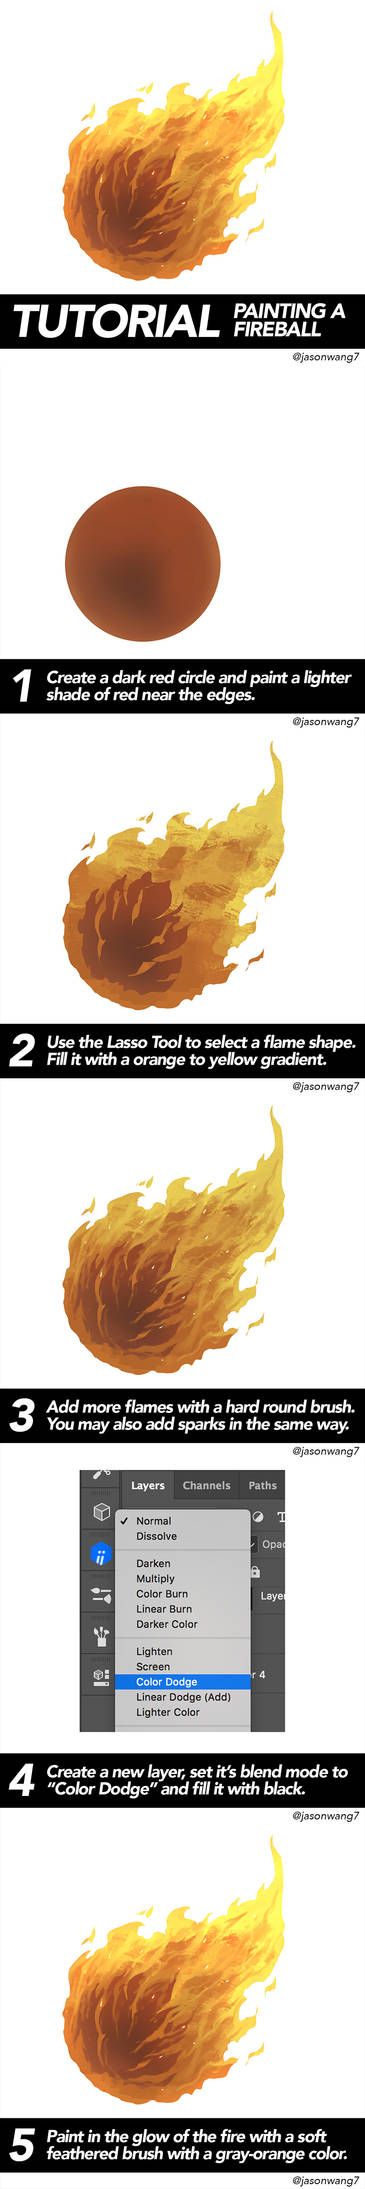 Fireball tutorial